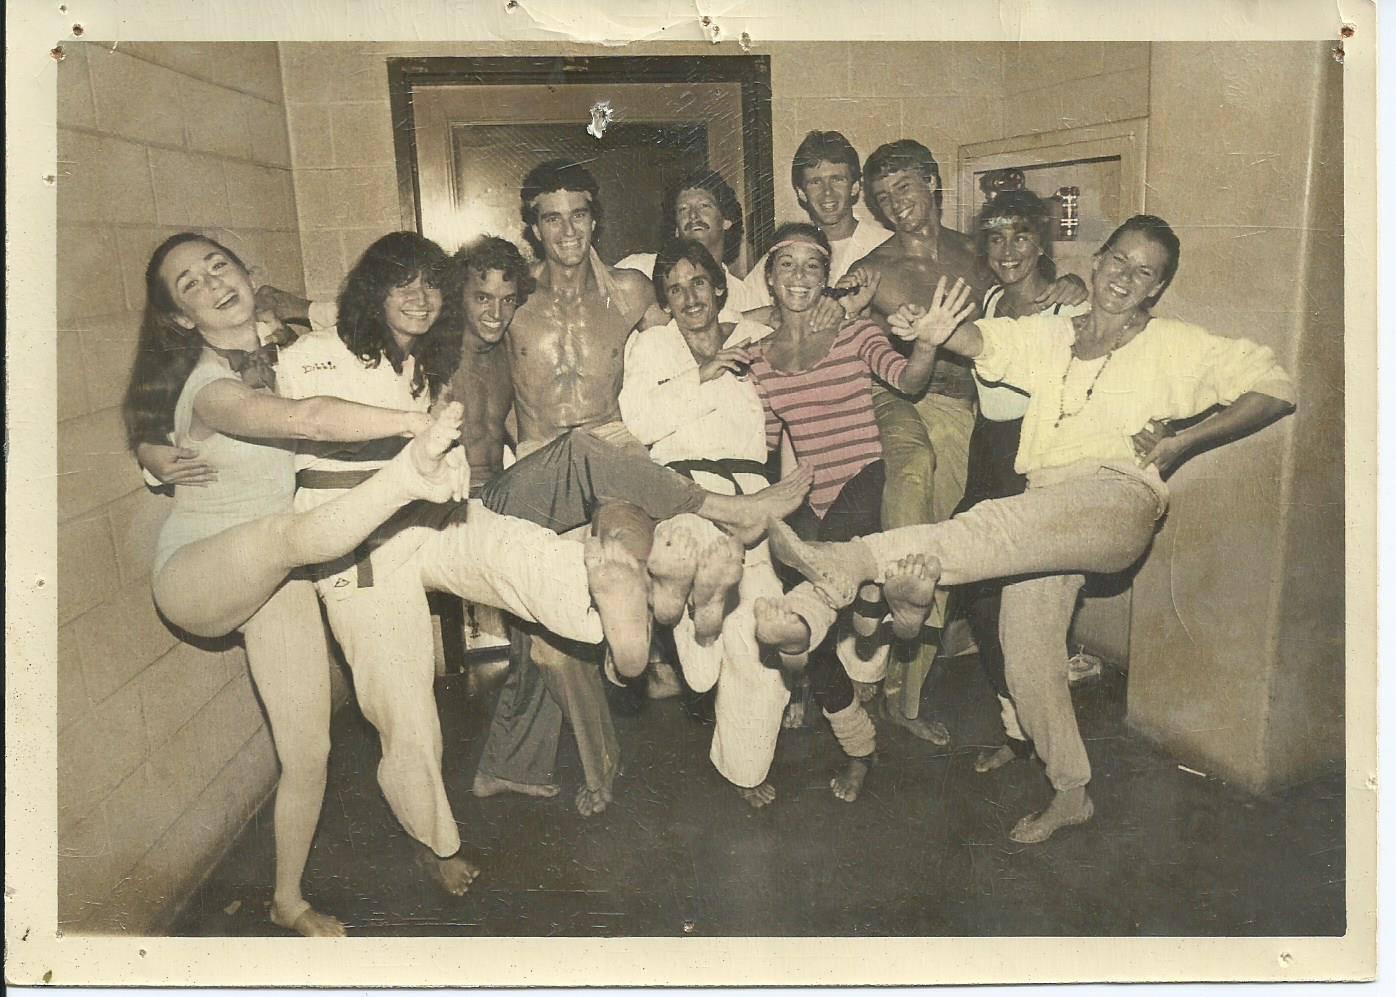 Body Arts Performance - 1984